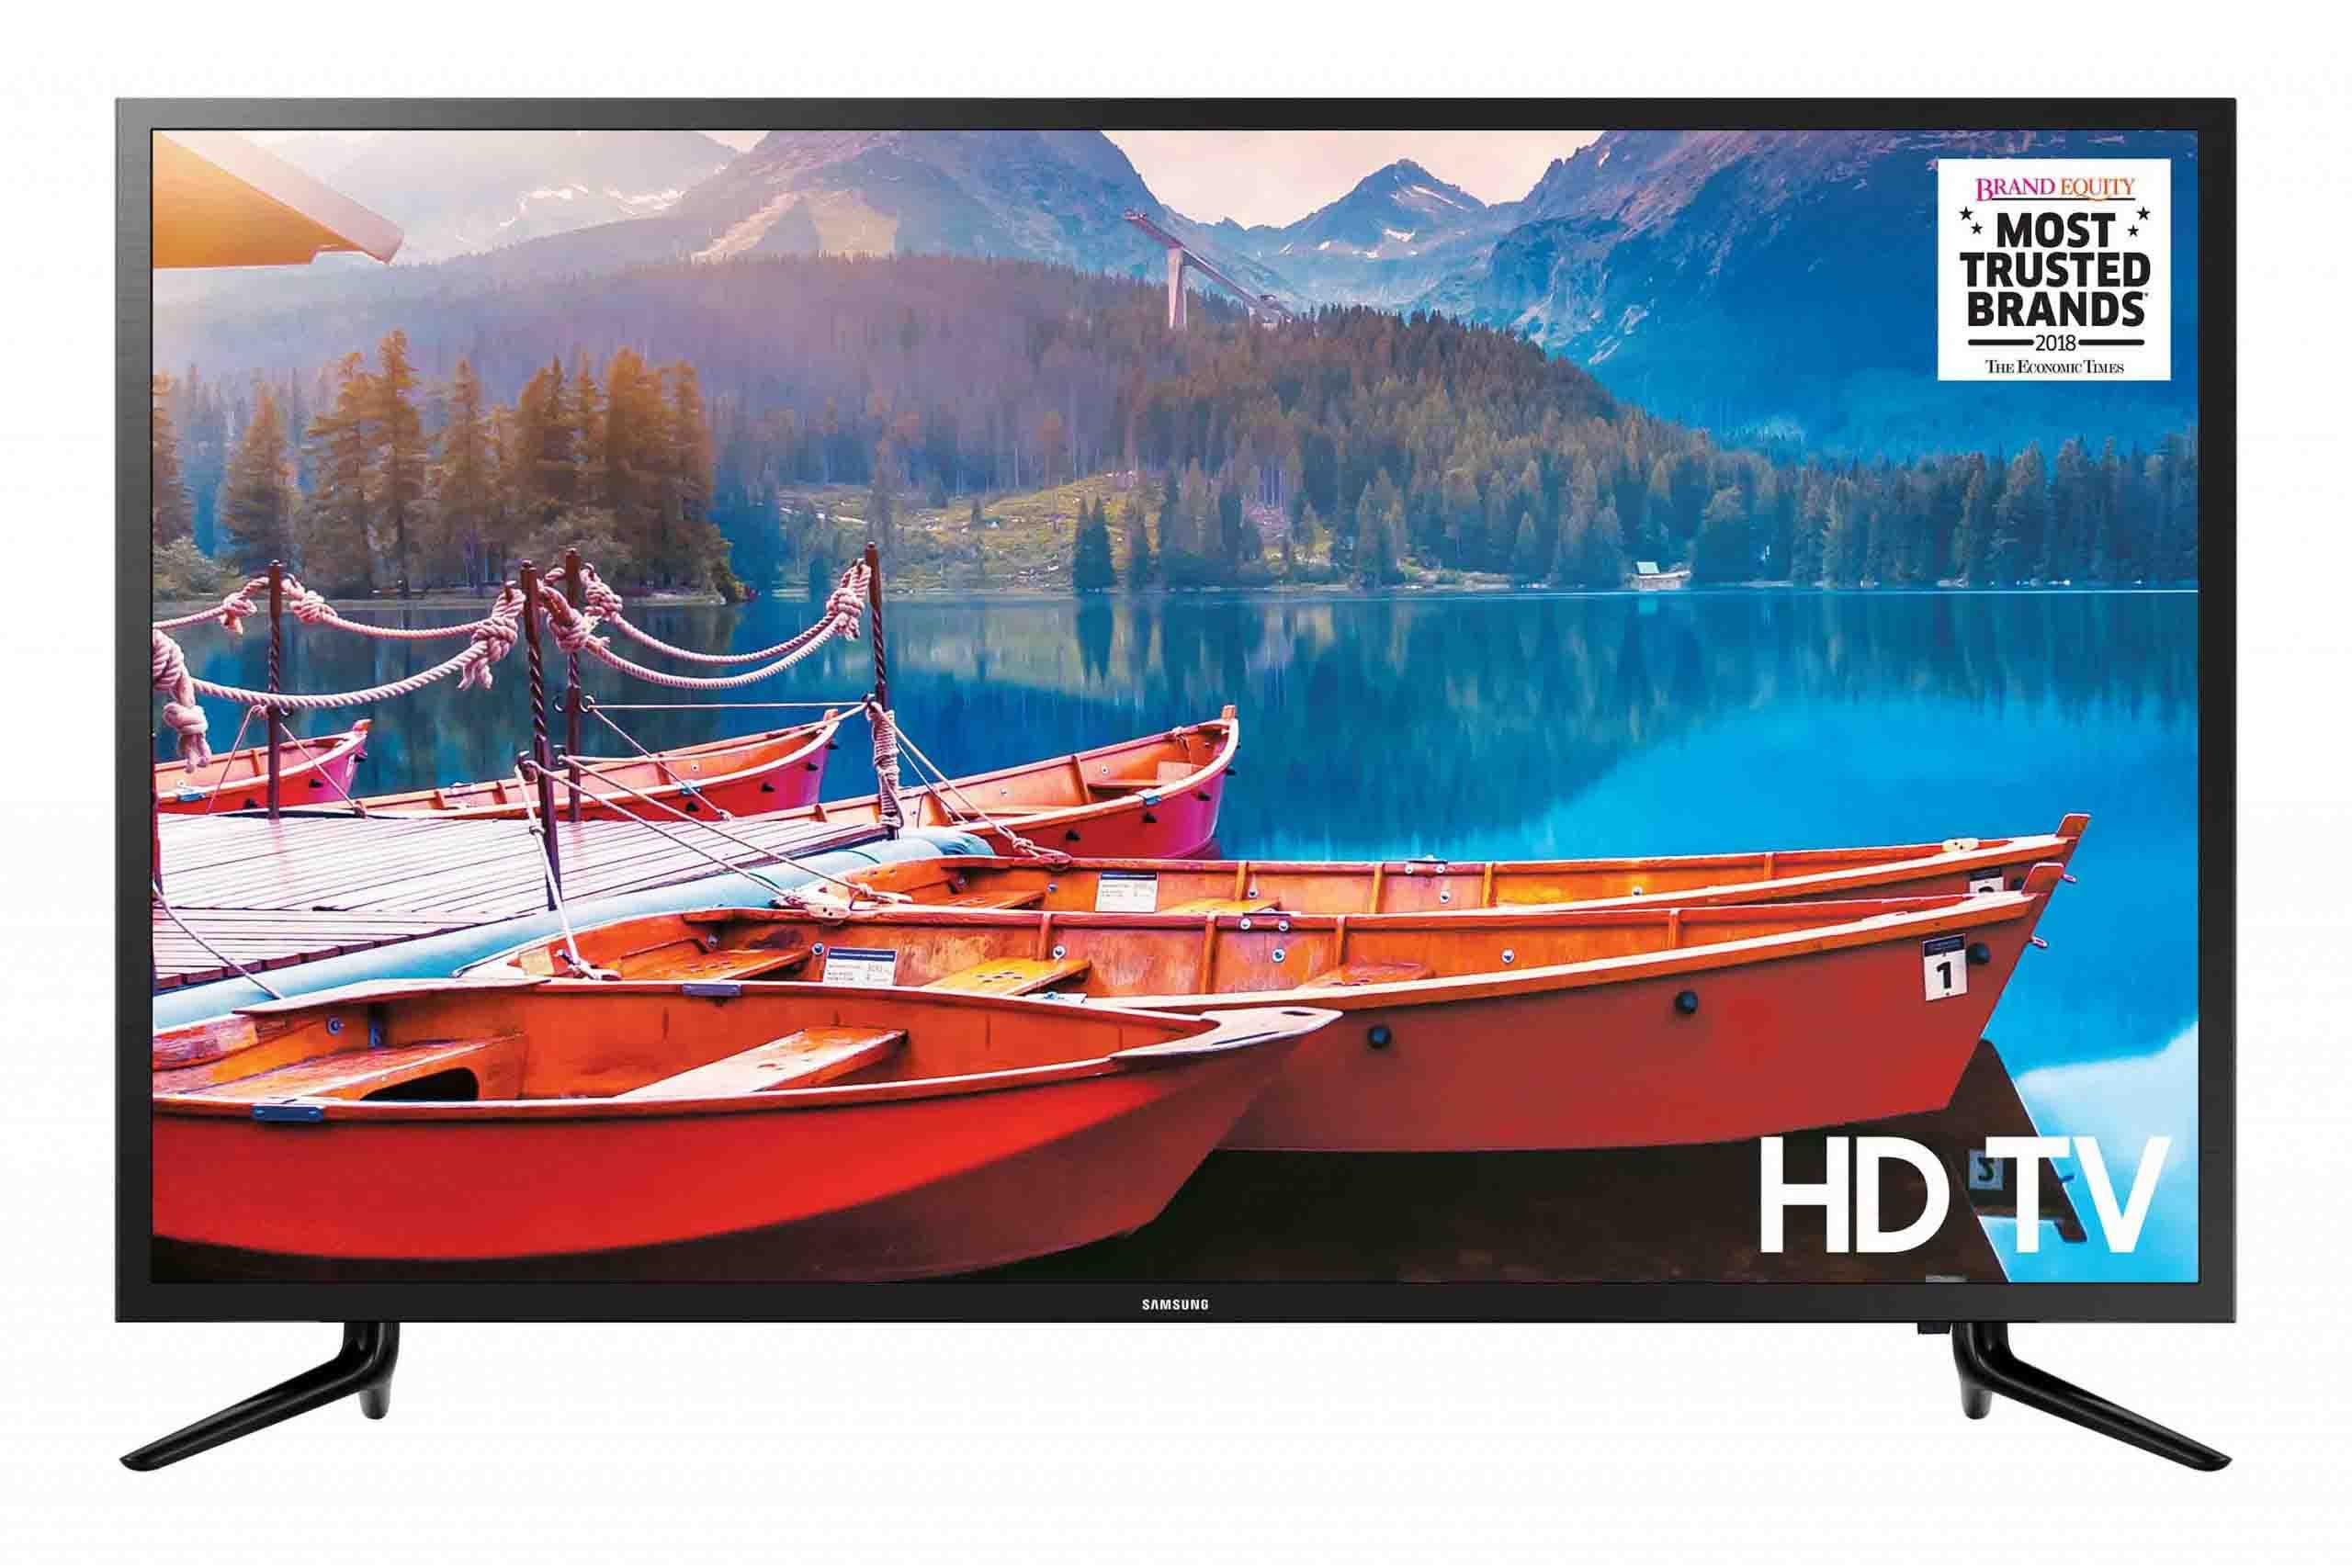 Samsung TV scaled 1